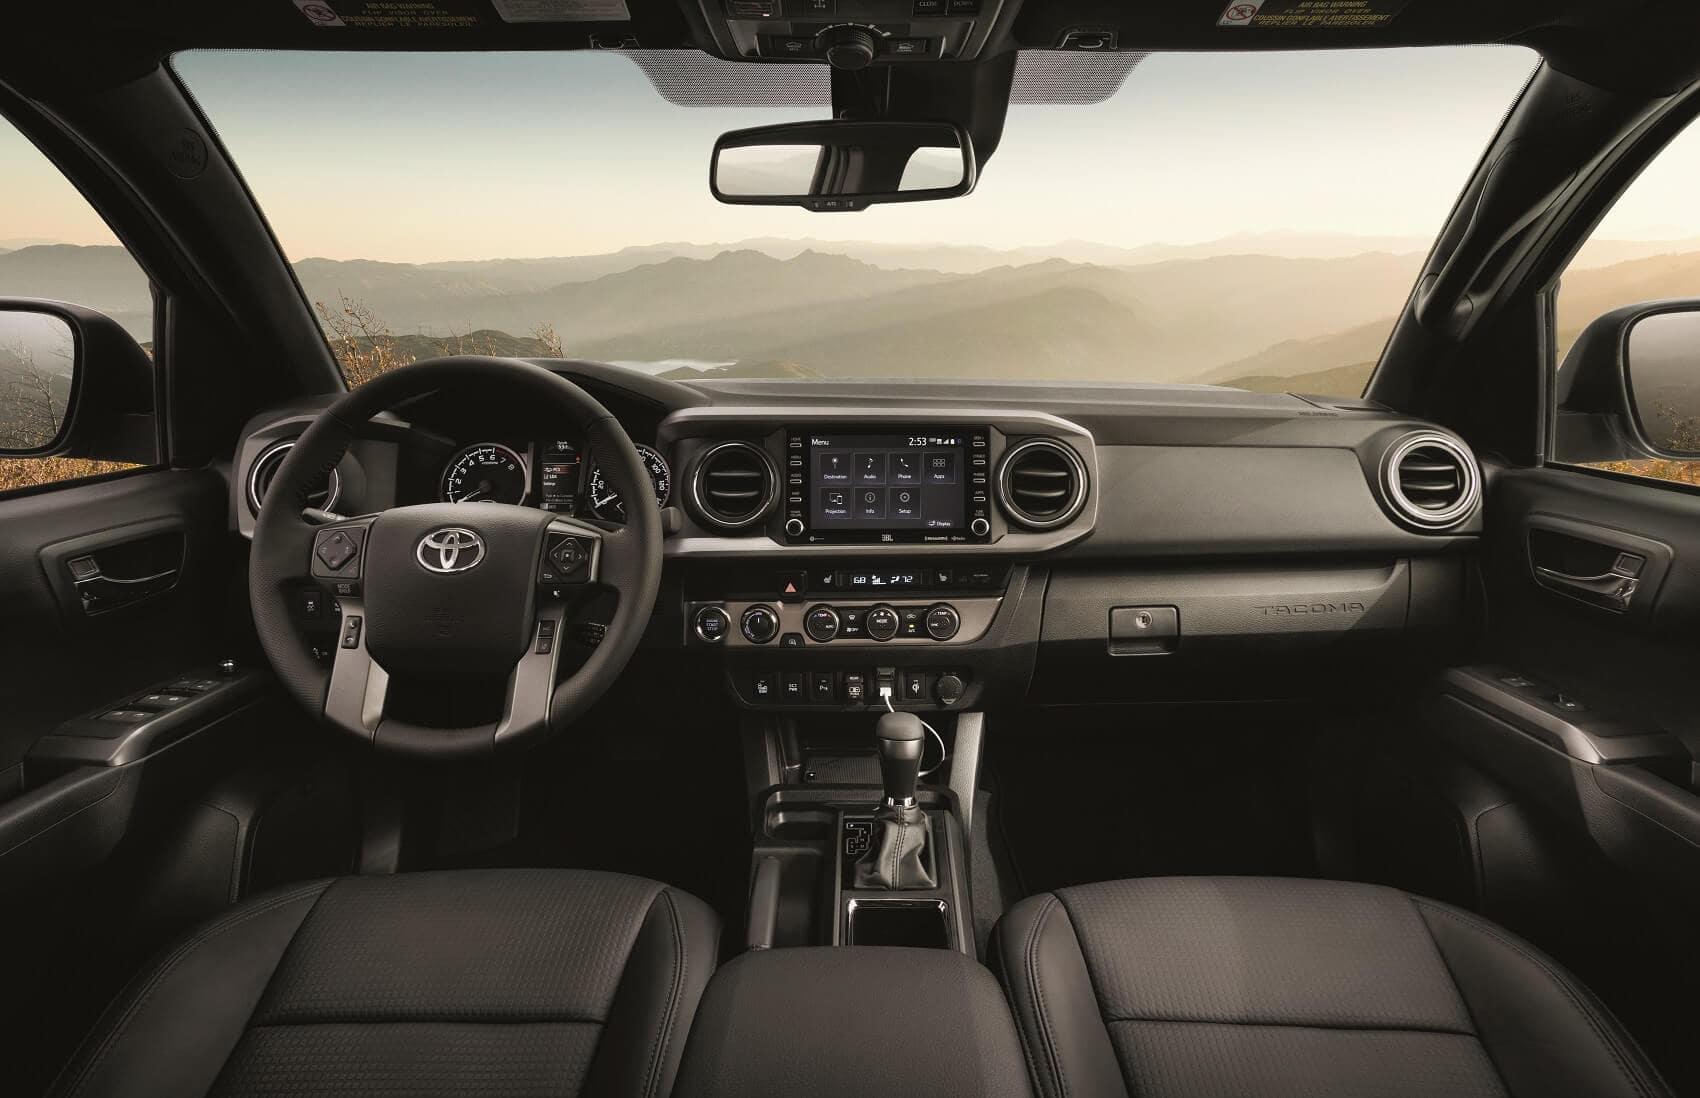 Toyota Tacoma Interior Features